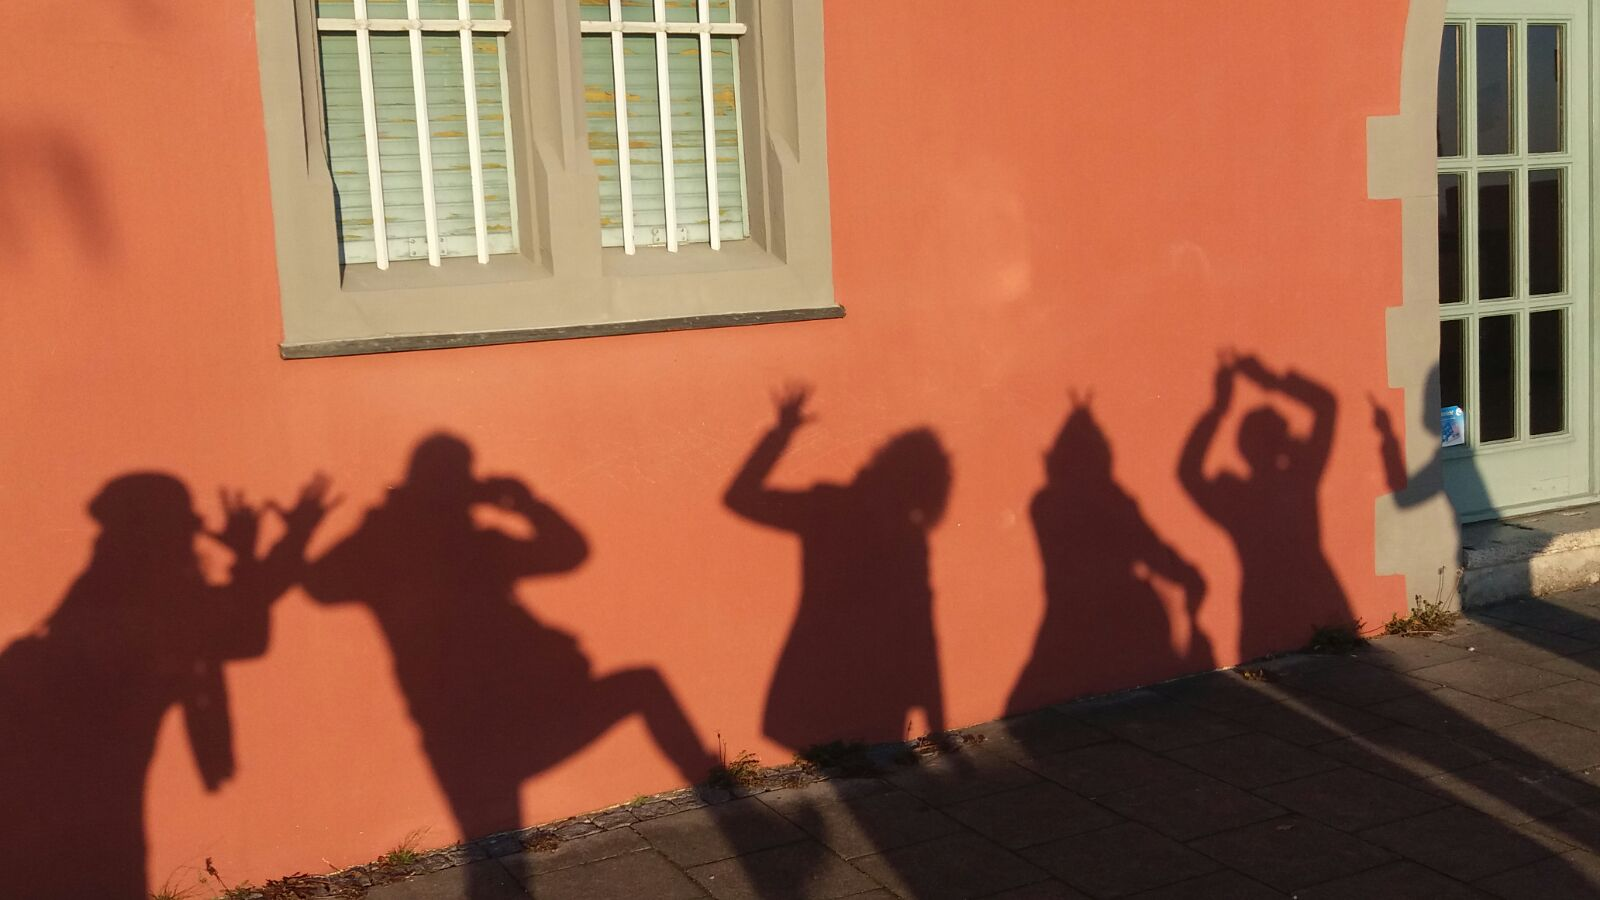 Schattenspieler